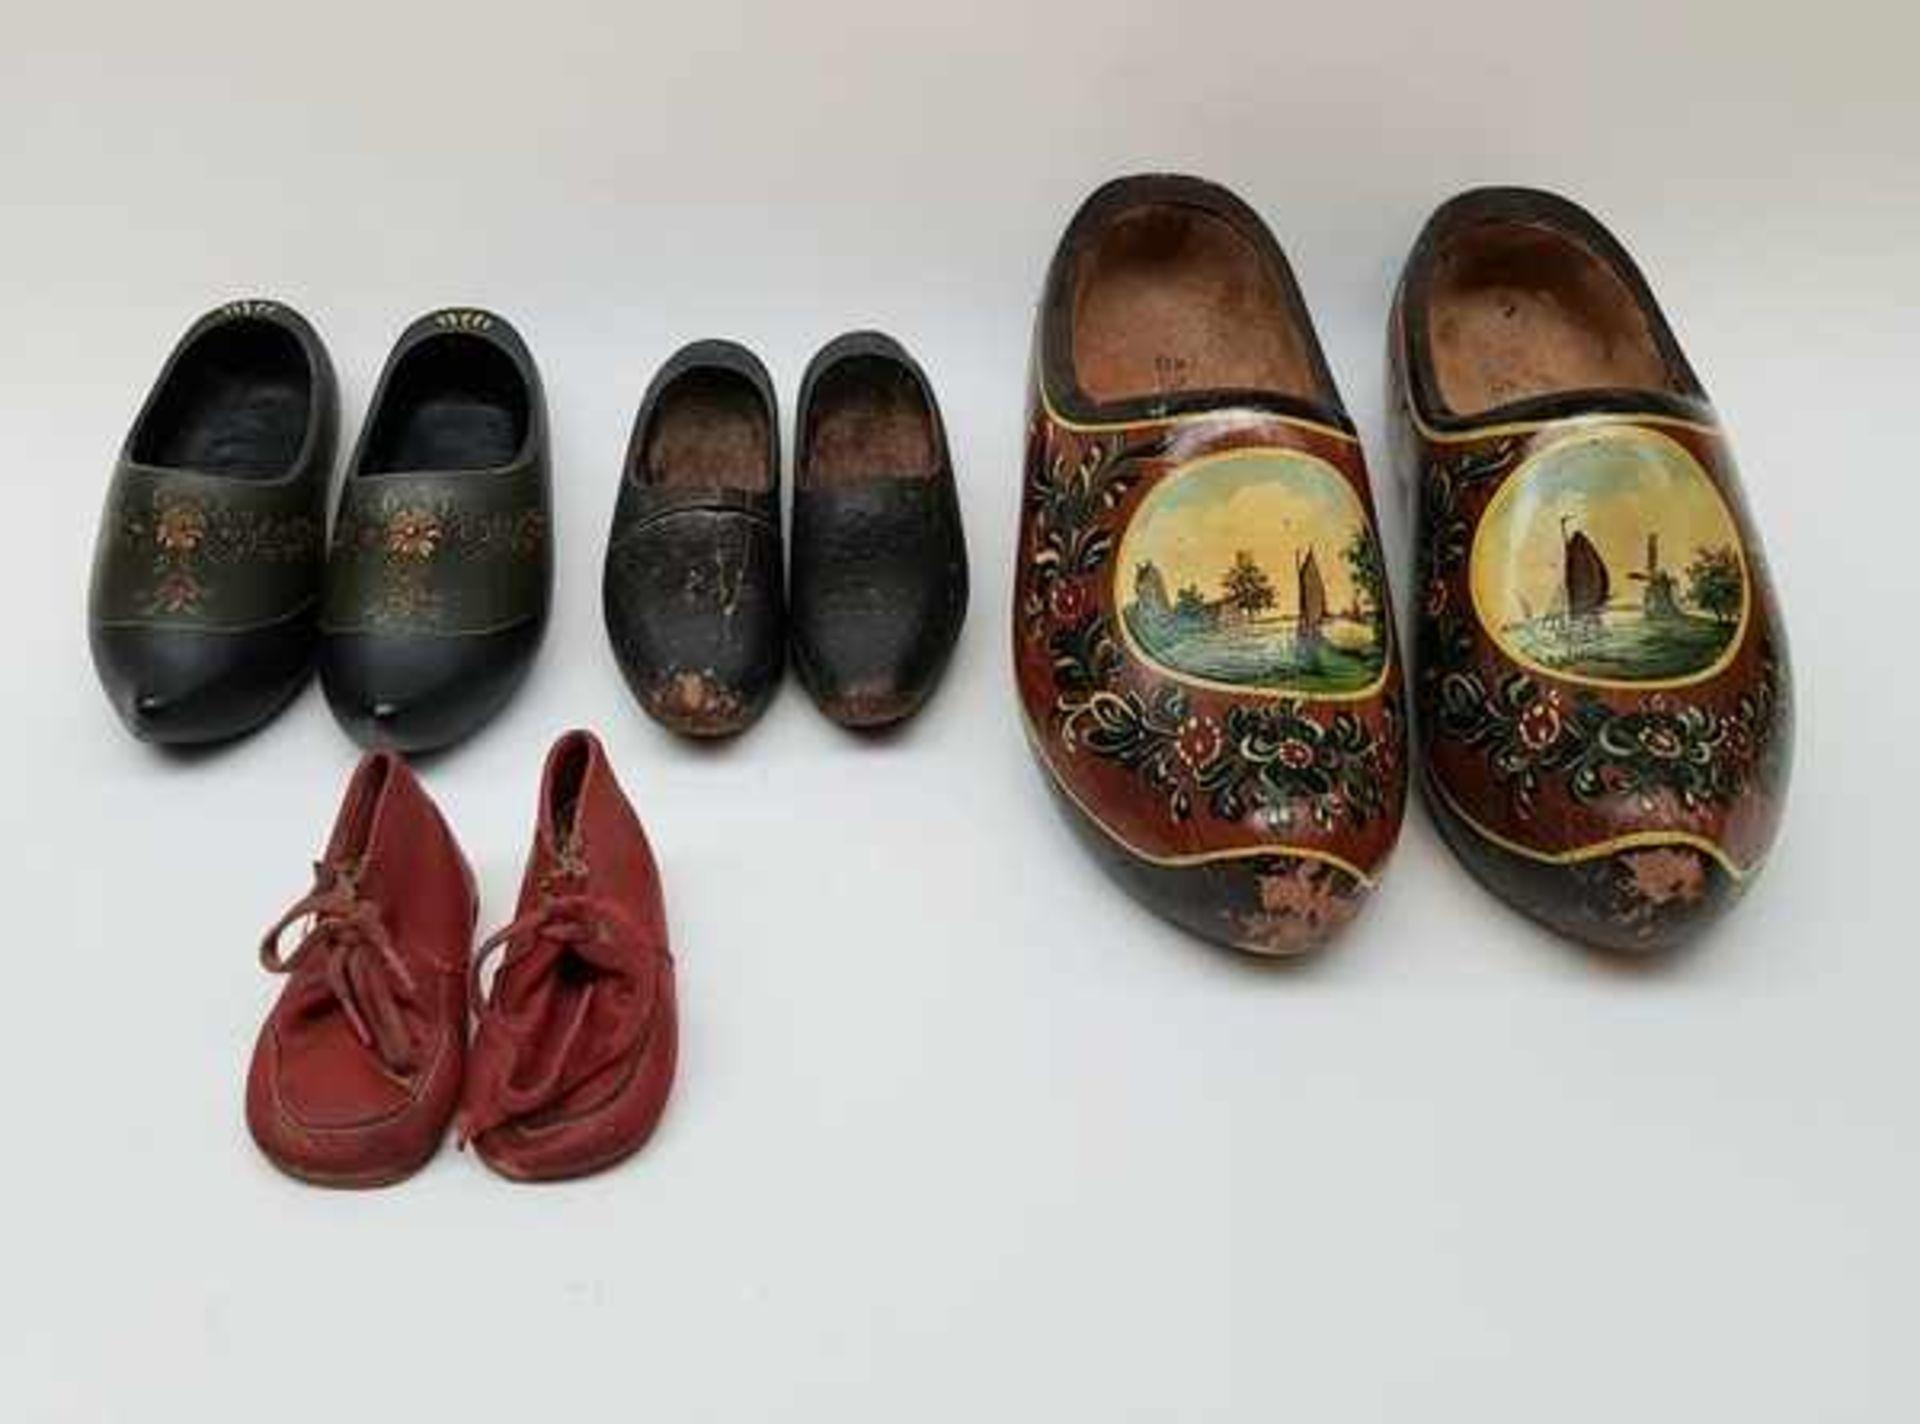 (Curiosa) Klompen en schoentjes